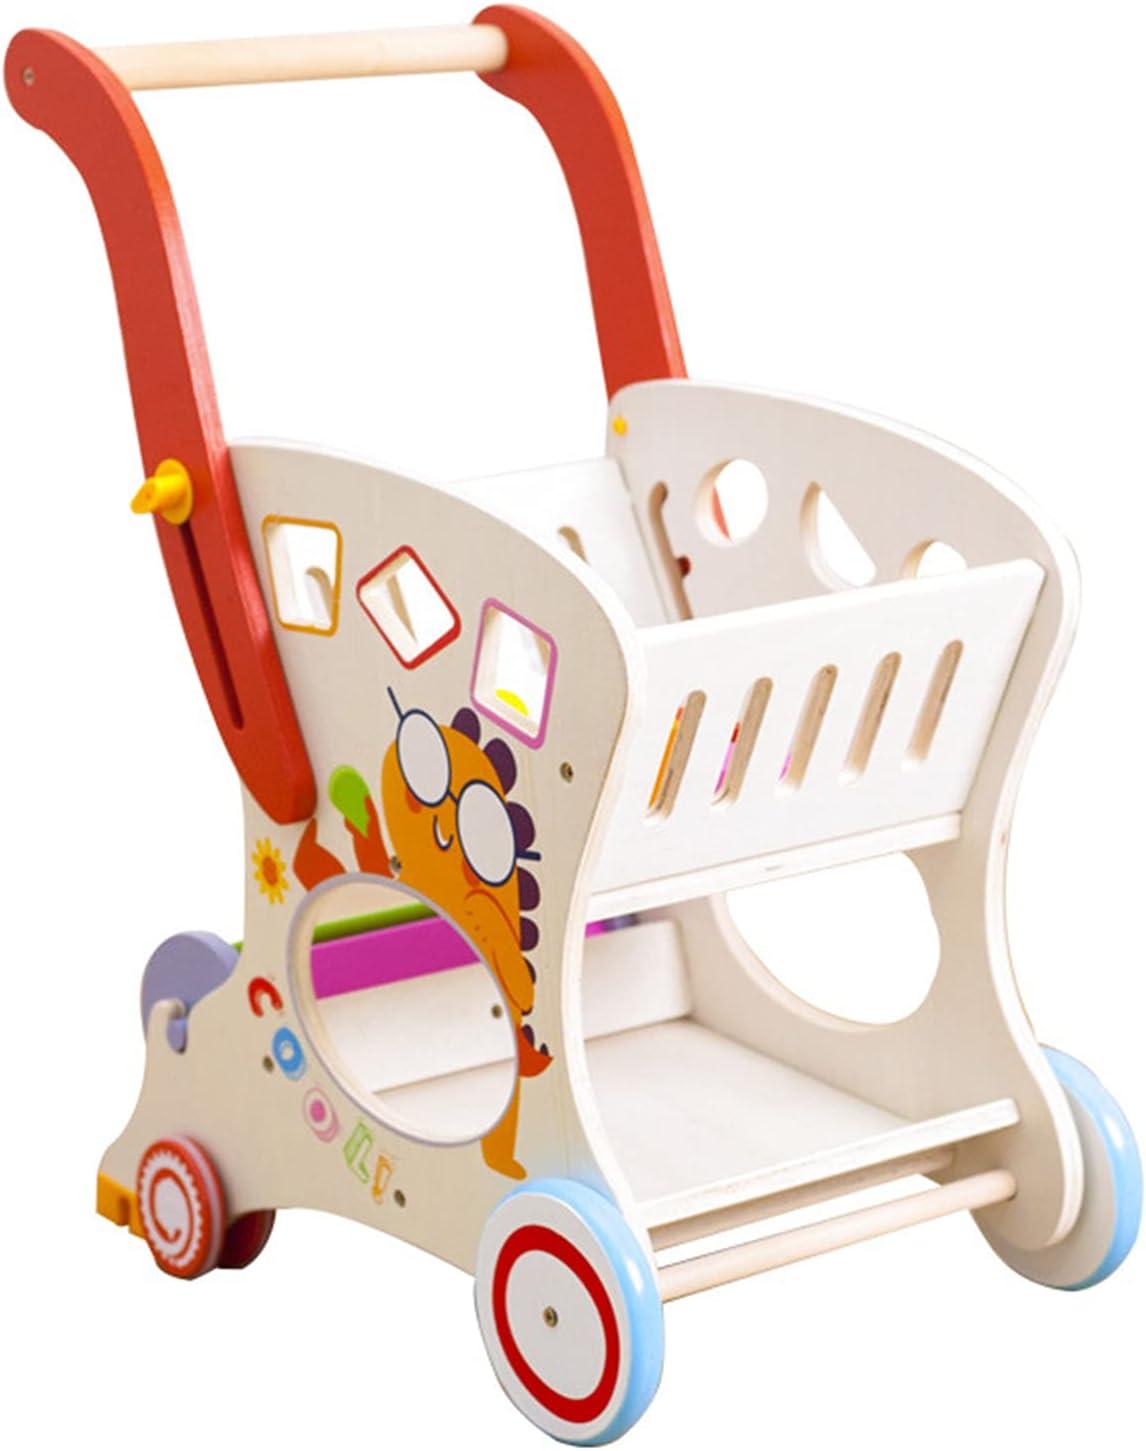 Wooden Shopping Trolley Little Shopper Role Play Pretend Food Ki